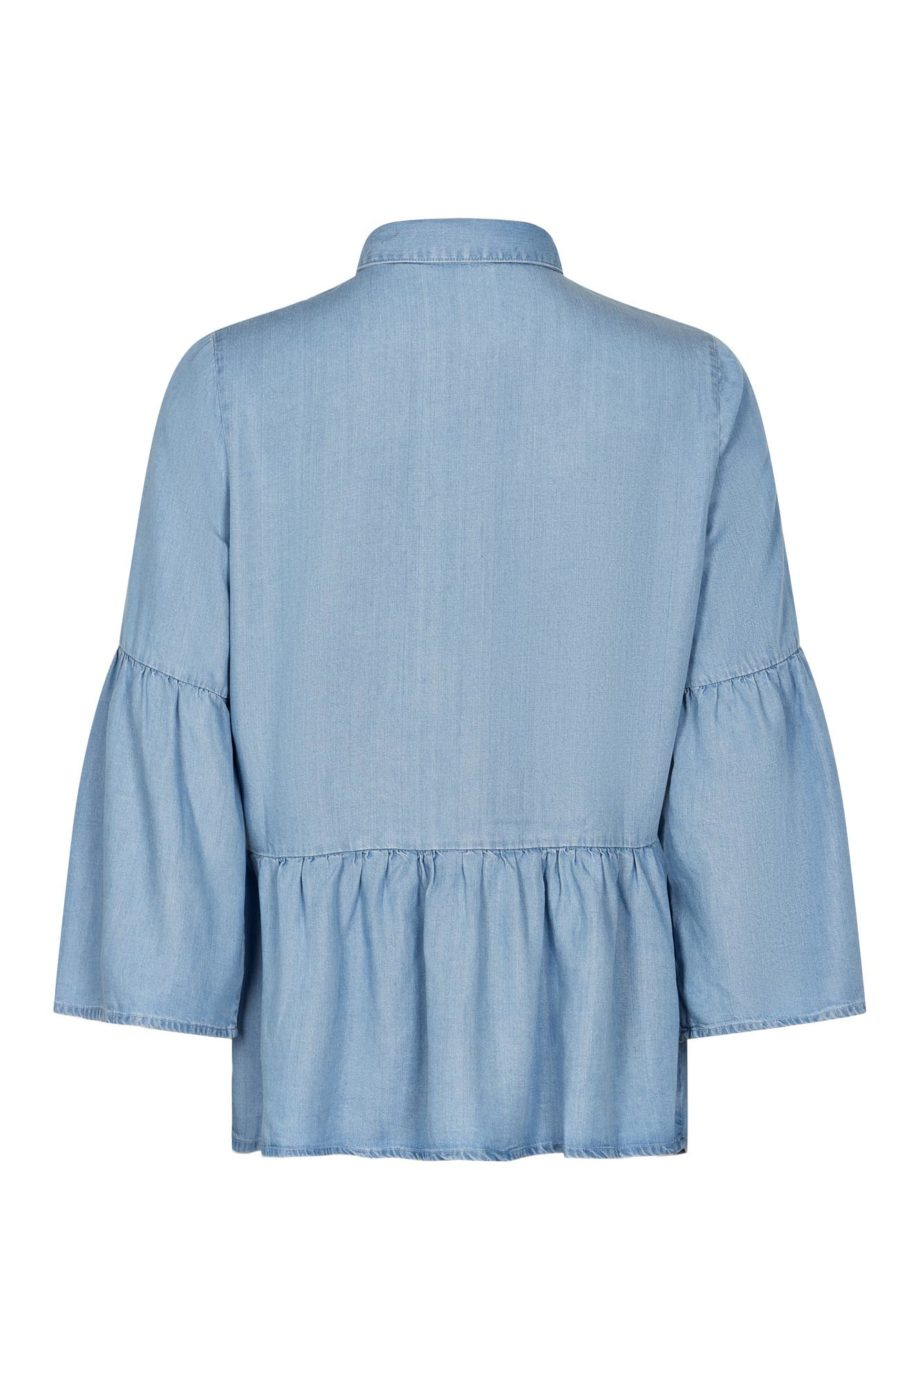 numph blusa nuahna espalda